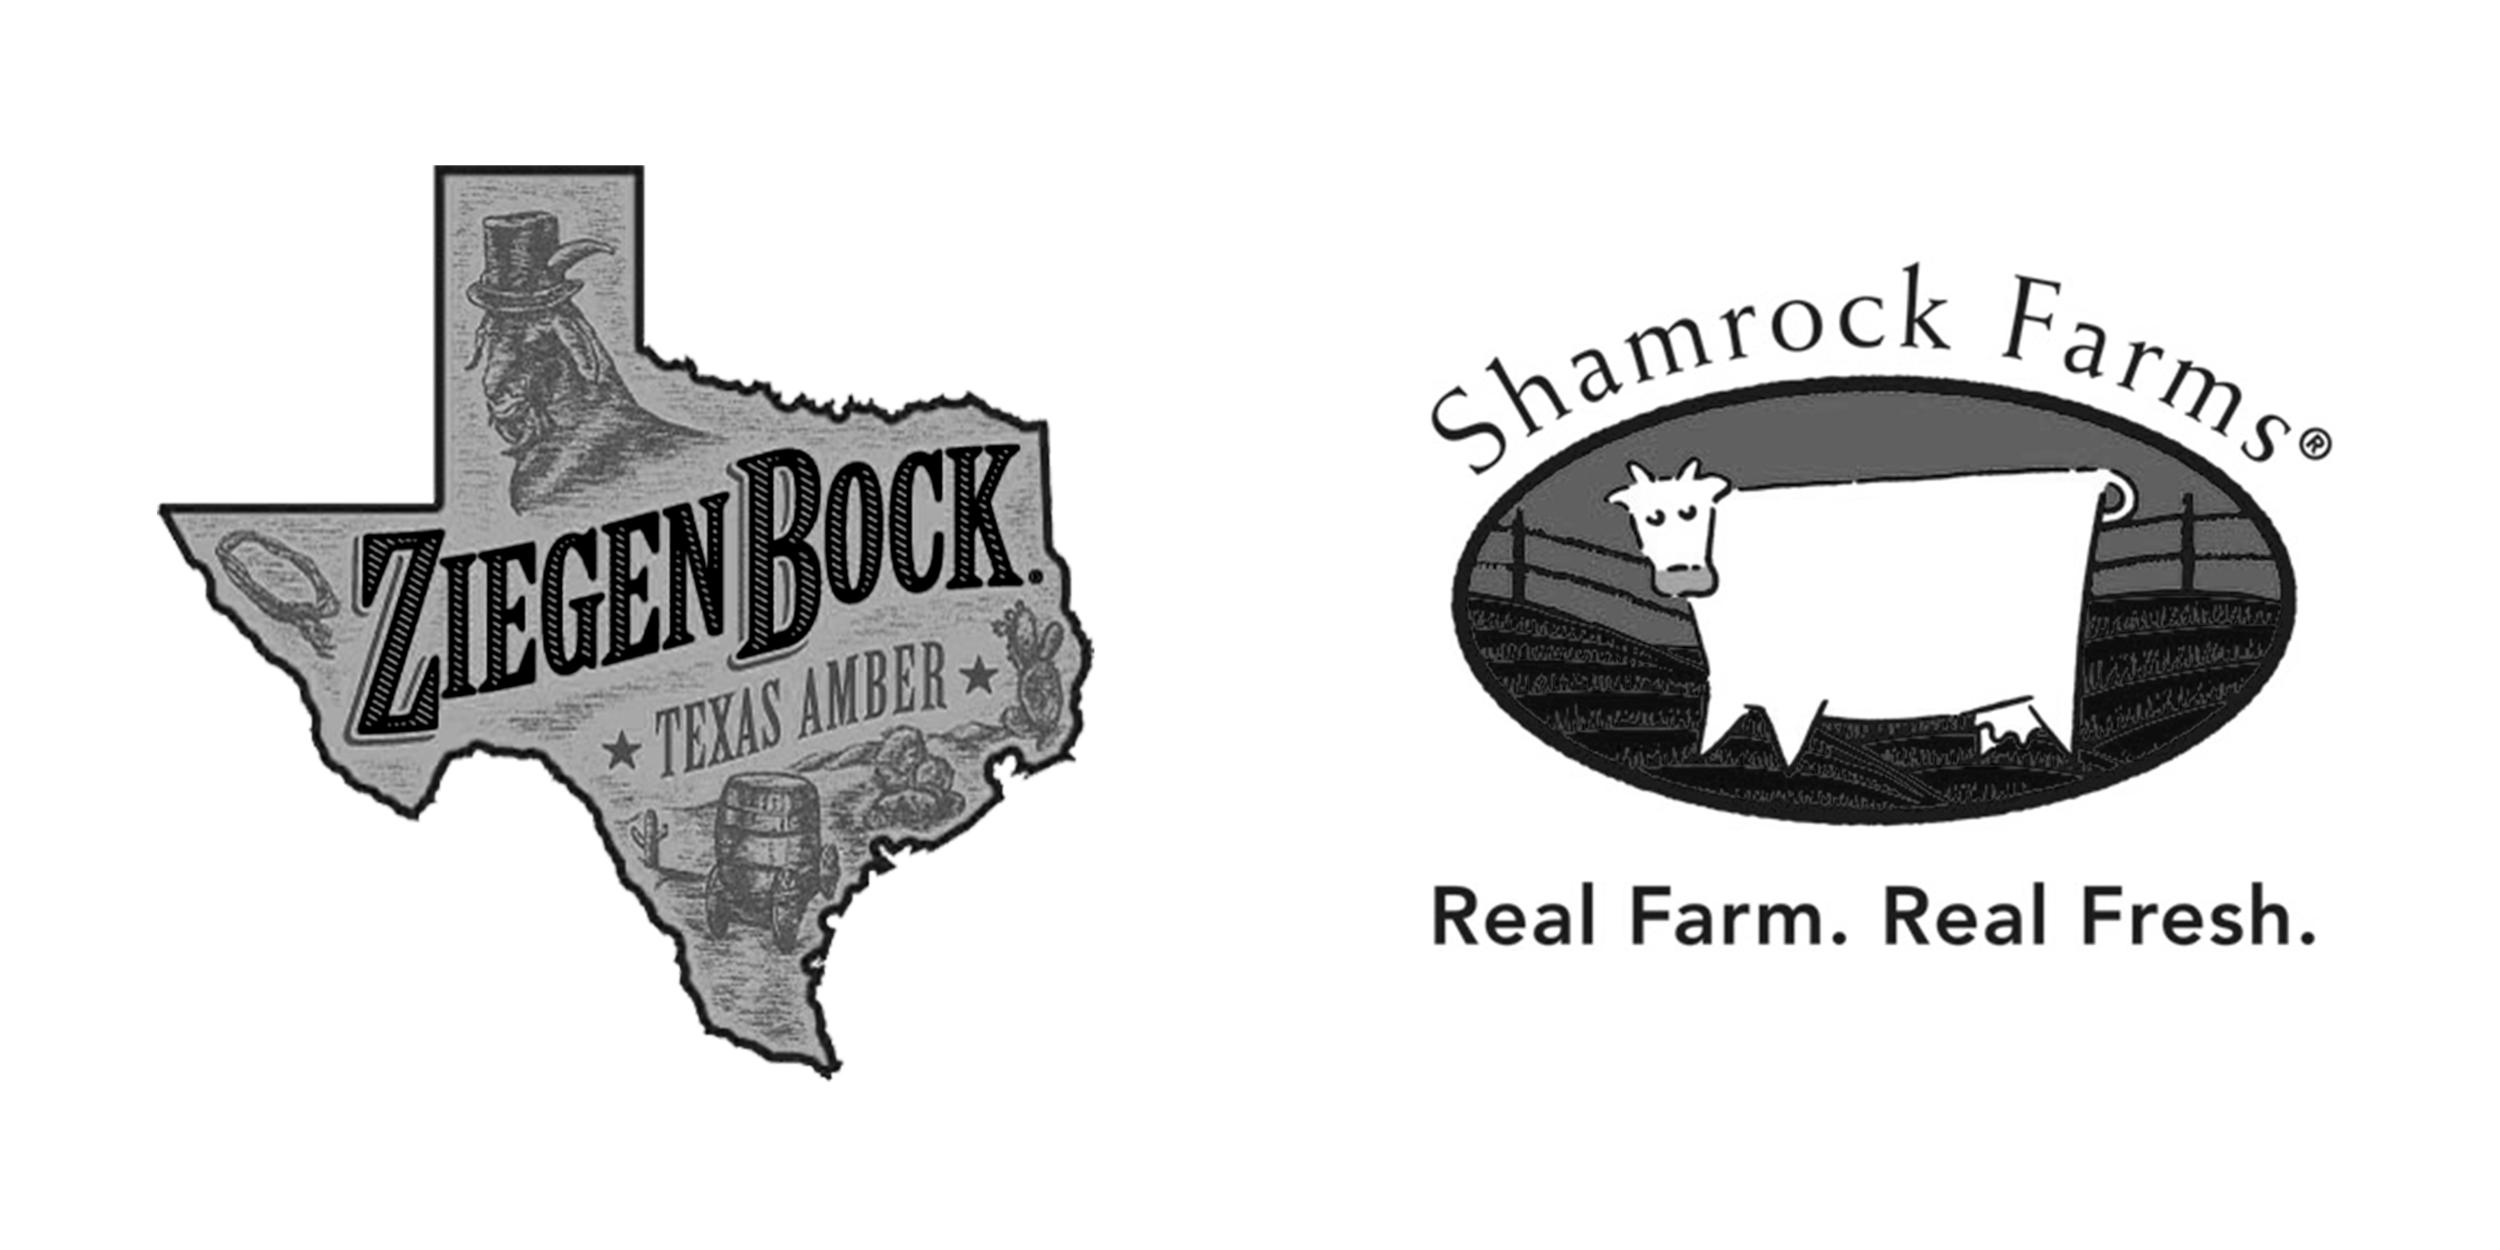 Ziegen Bock + Shamrock Farms.png